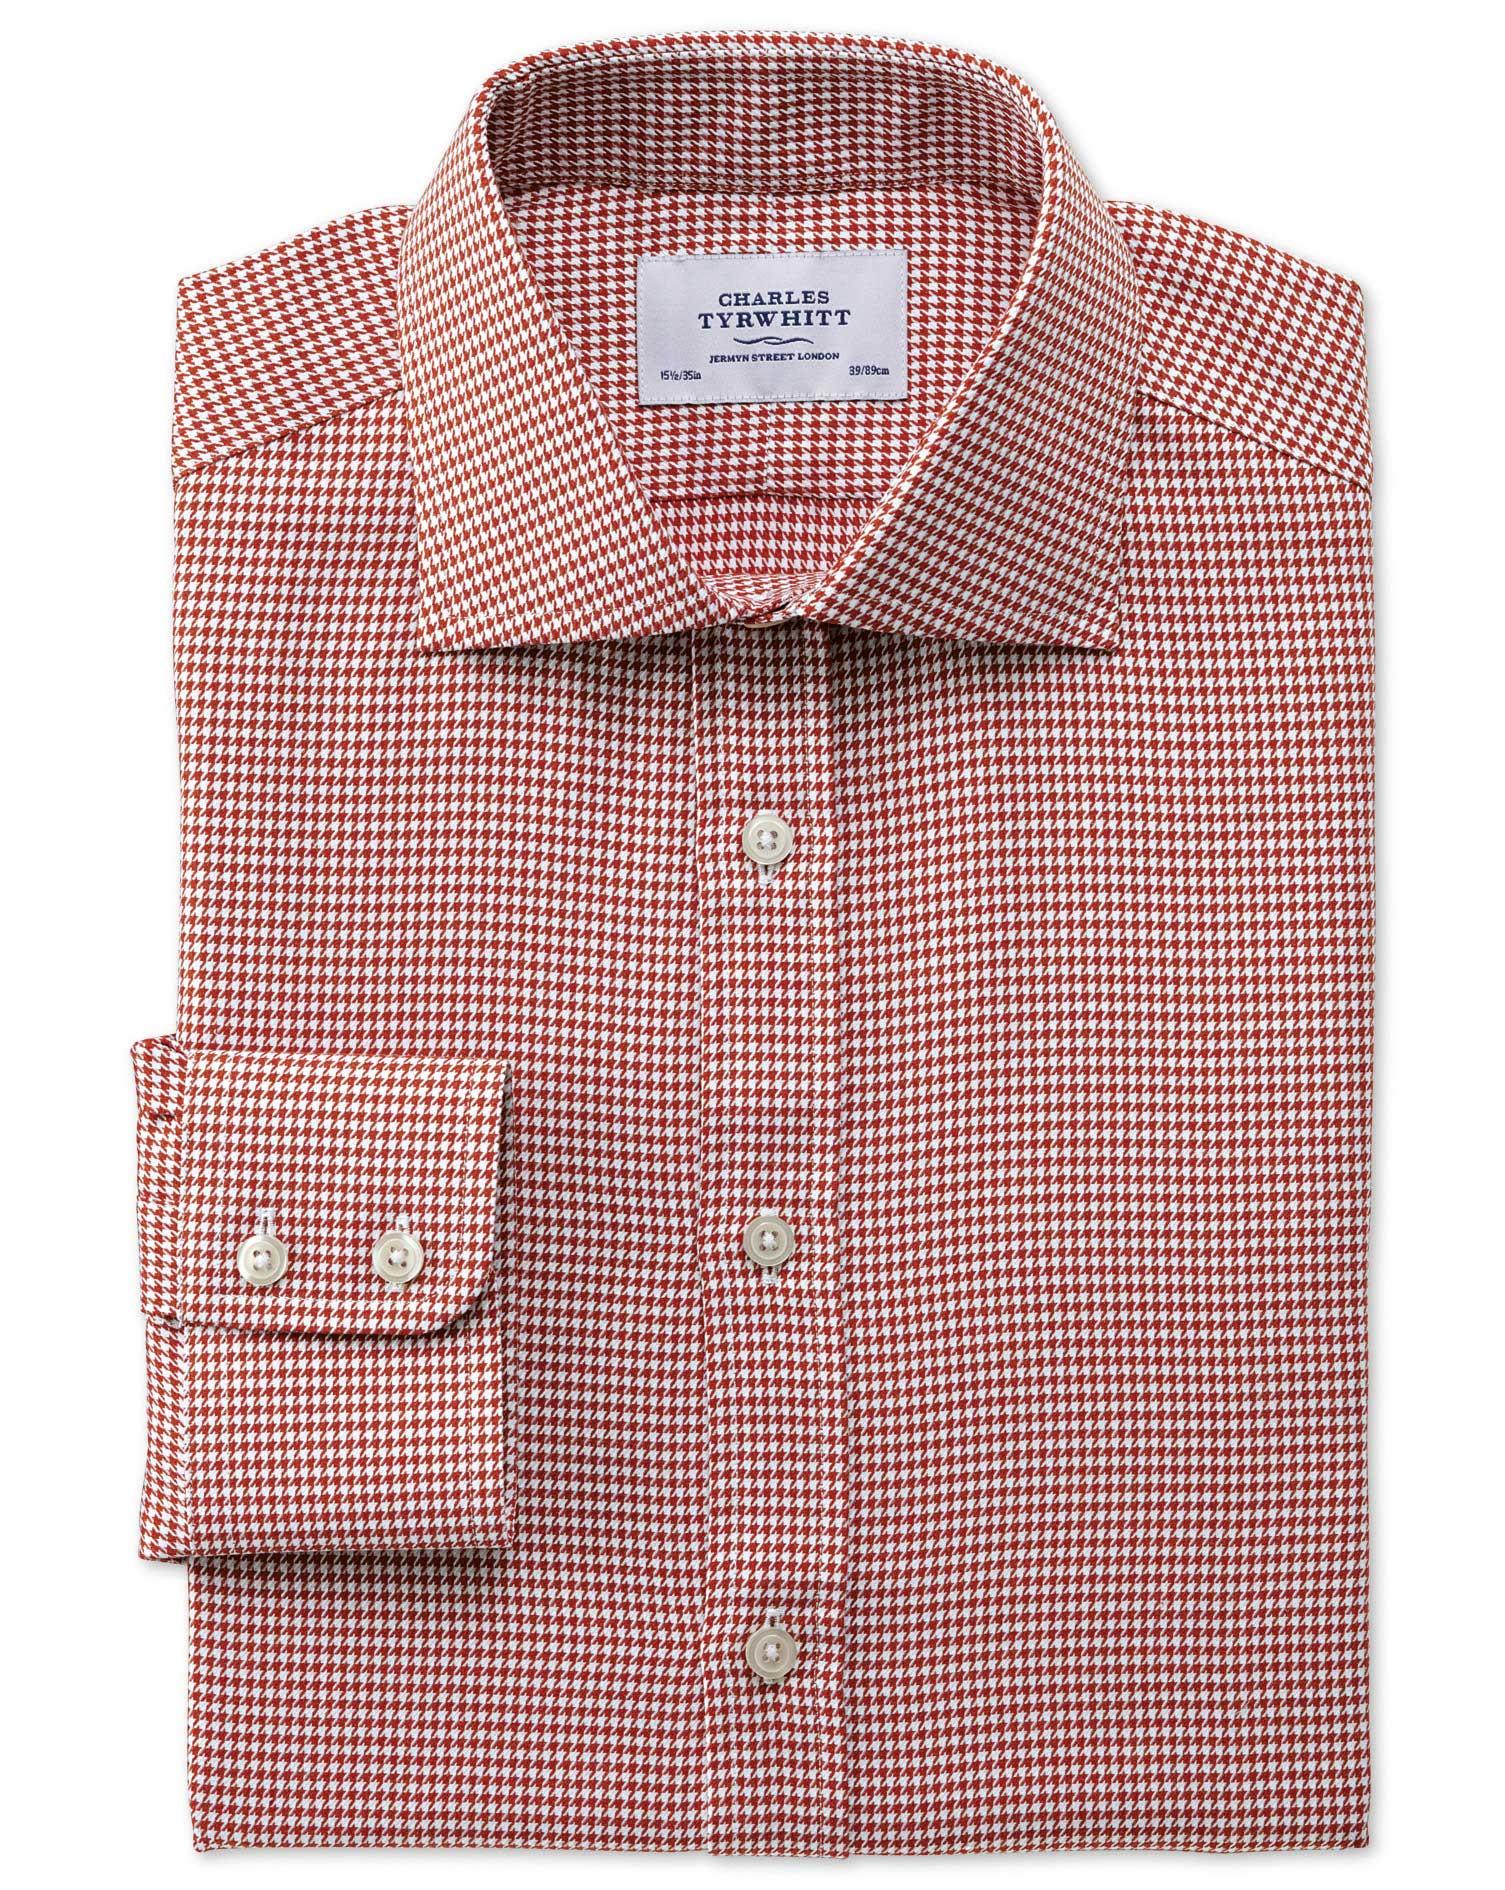 Extra Slim Fit Semi-Cutaway Collar Melange Puppytooth Copper Cotton Formal Shirt Single Cuff Size 16